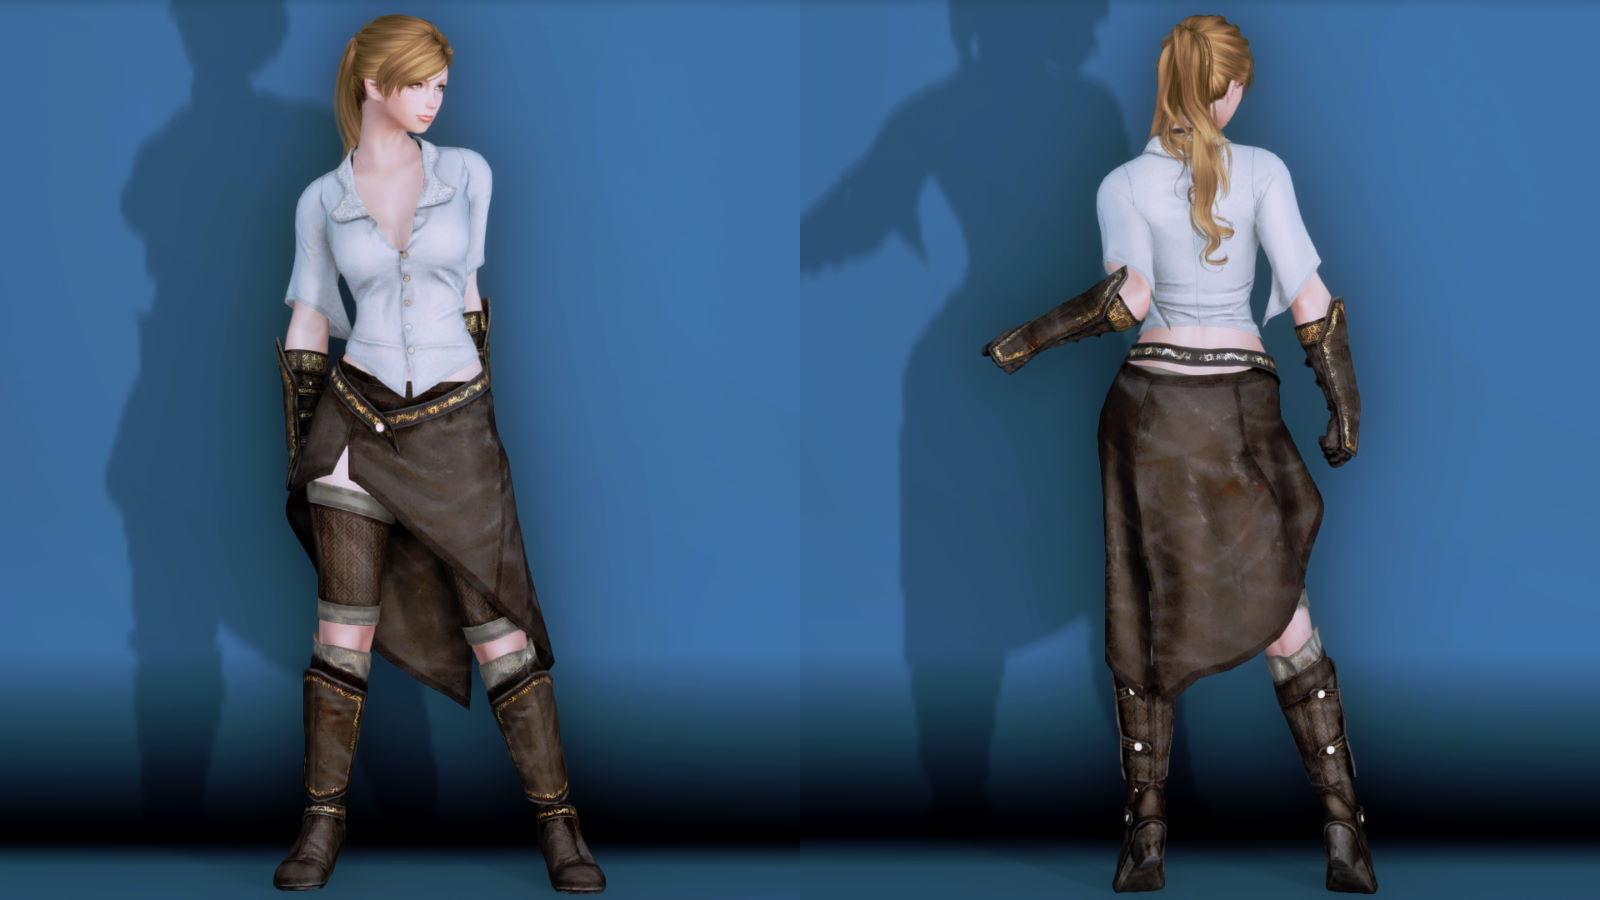 RuggedRogueSSE 111-1 Pose Fu-Ba-F Blouse Skirt 2